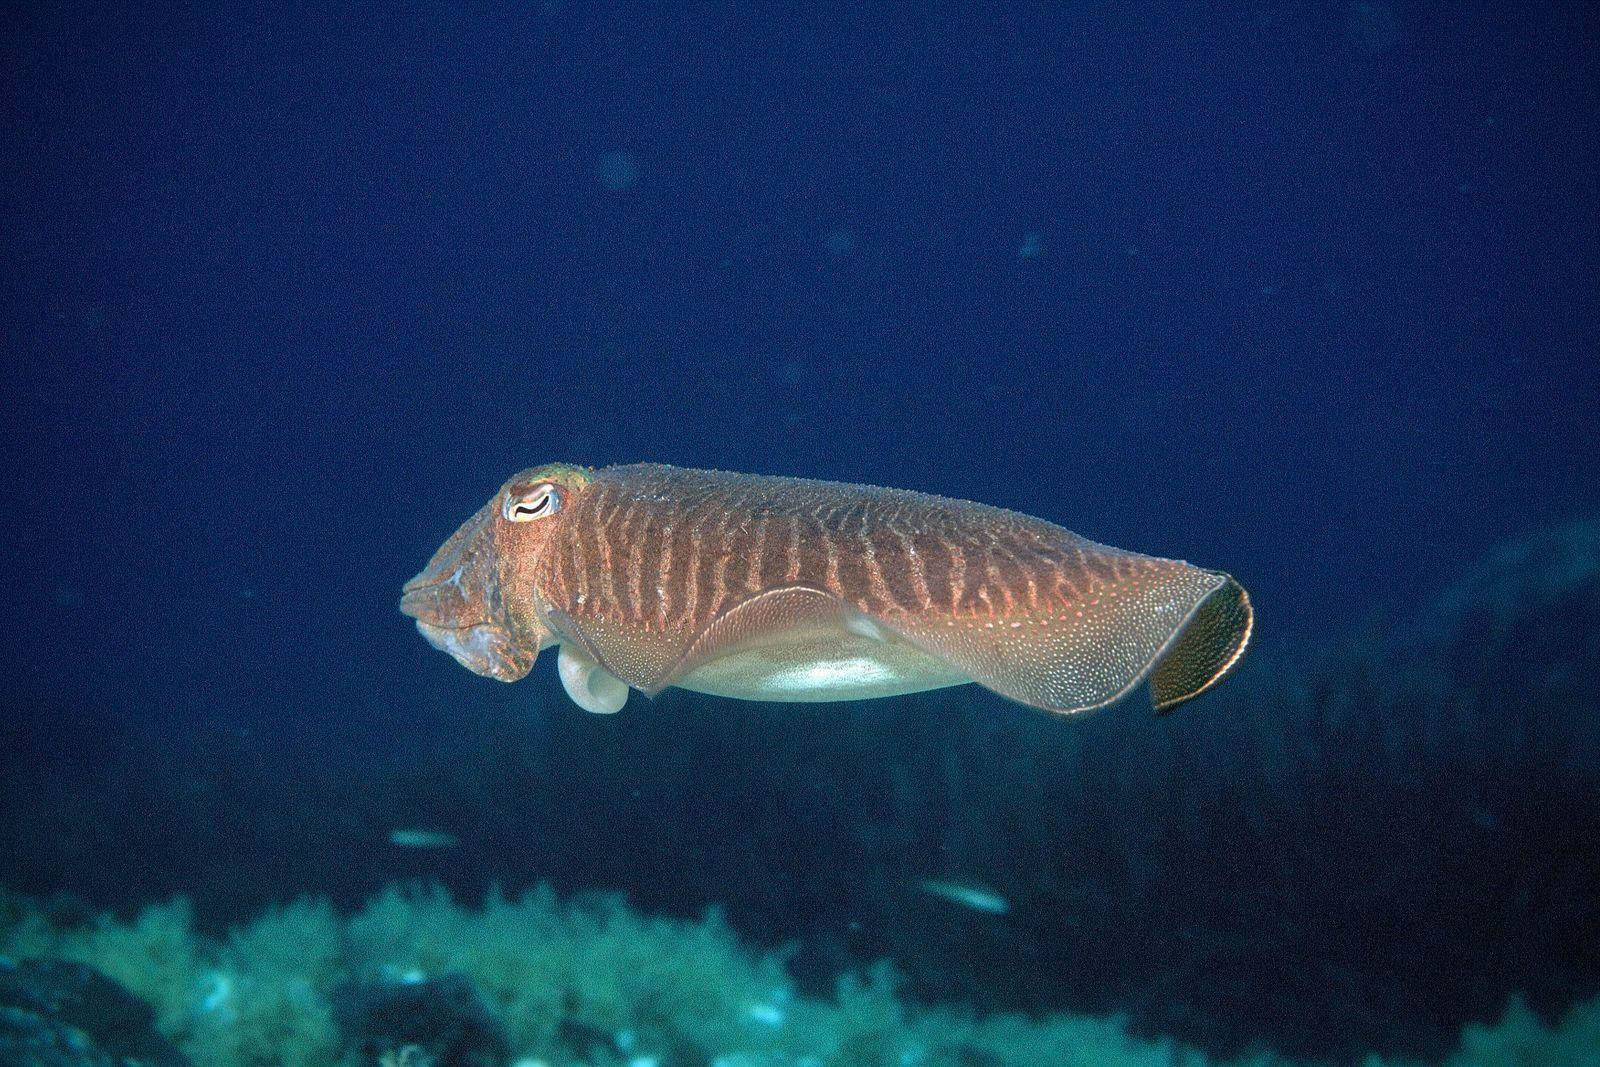 Gemeine Sepia, Sepia officinalis, common cuttlefish